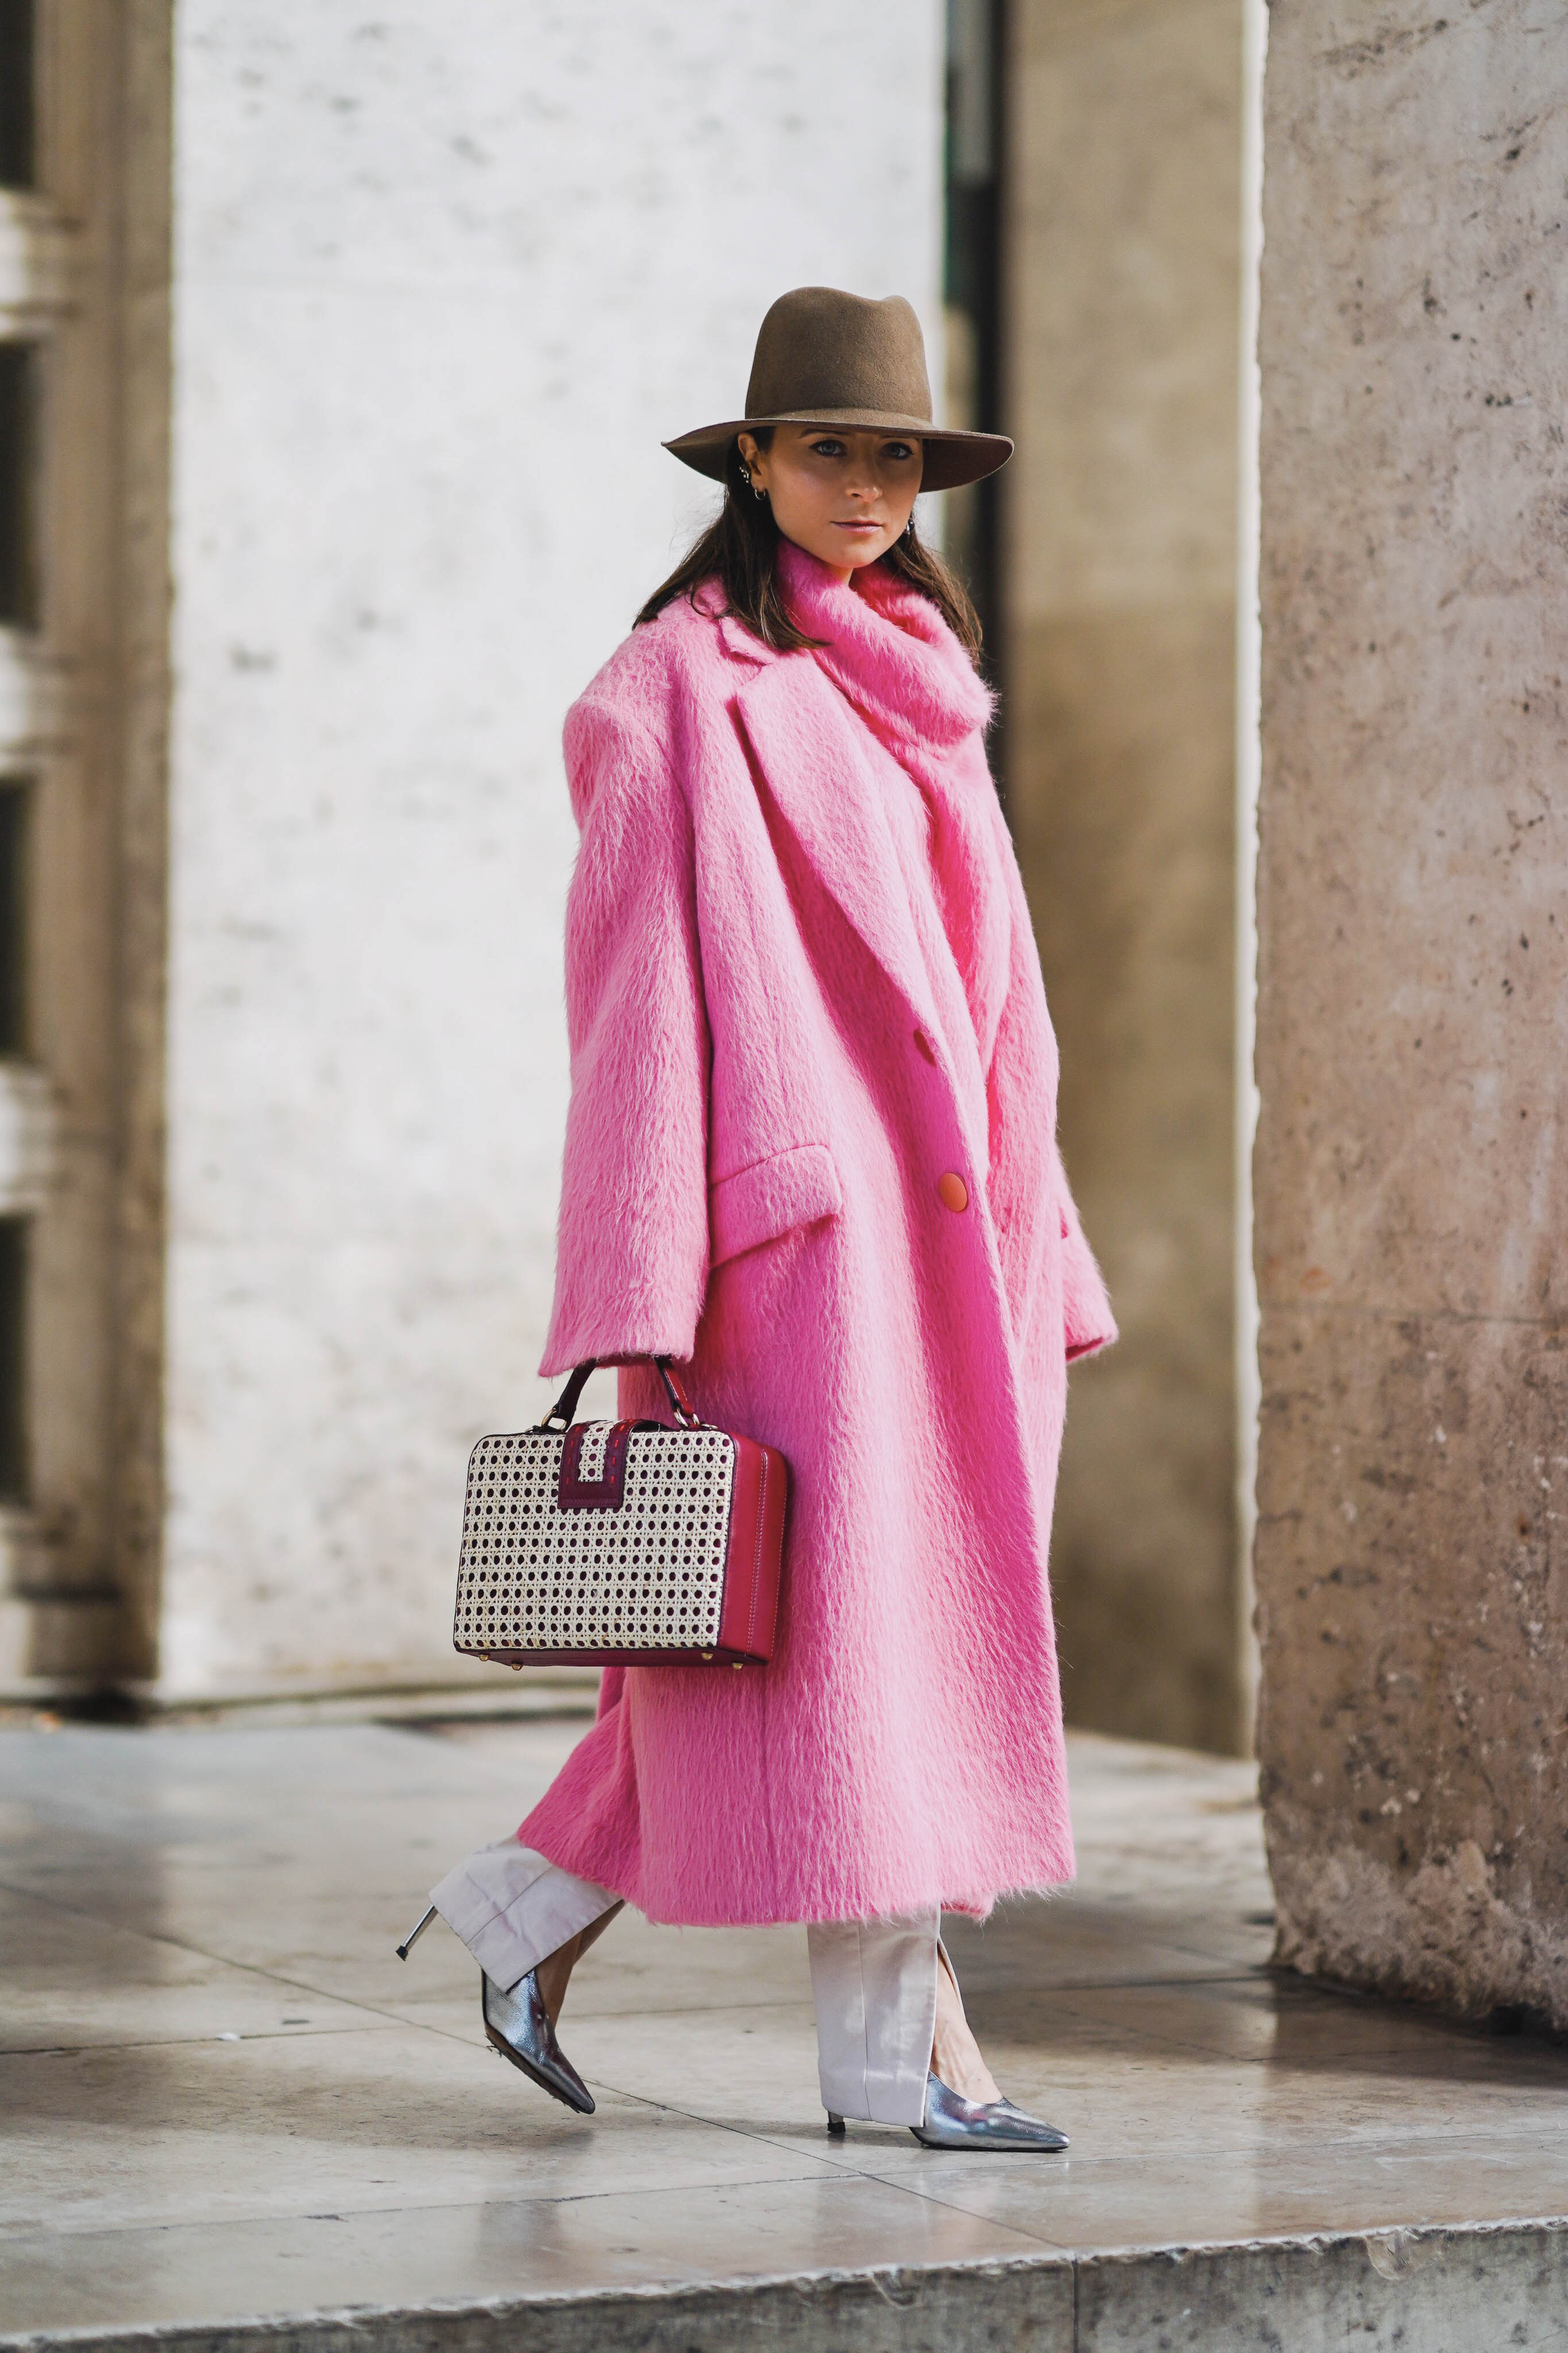 PFW SS20 Street Style Fall 2019 Paris Fashion Week Julia Comil wearing Kristina Fidelskaya coat, bag Mehry mu, pumps Clergerie, hat Janessa Leone